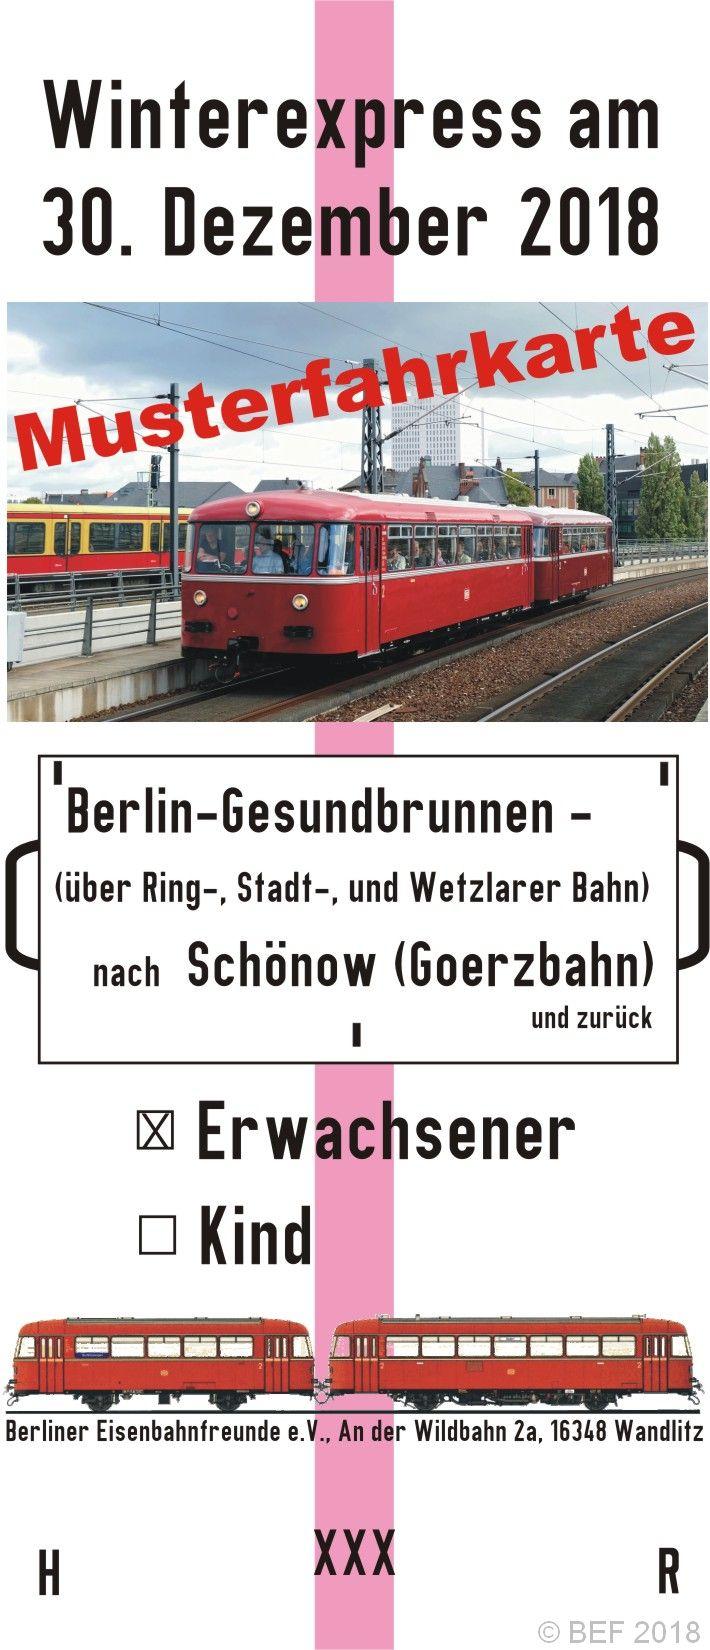 Musterfahrkarte Winterexpress 2018 der Berliner Eisenbahnfreunde e.V.